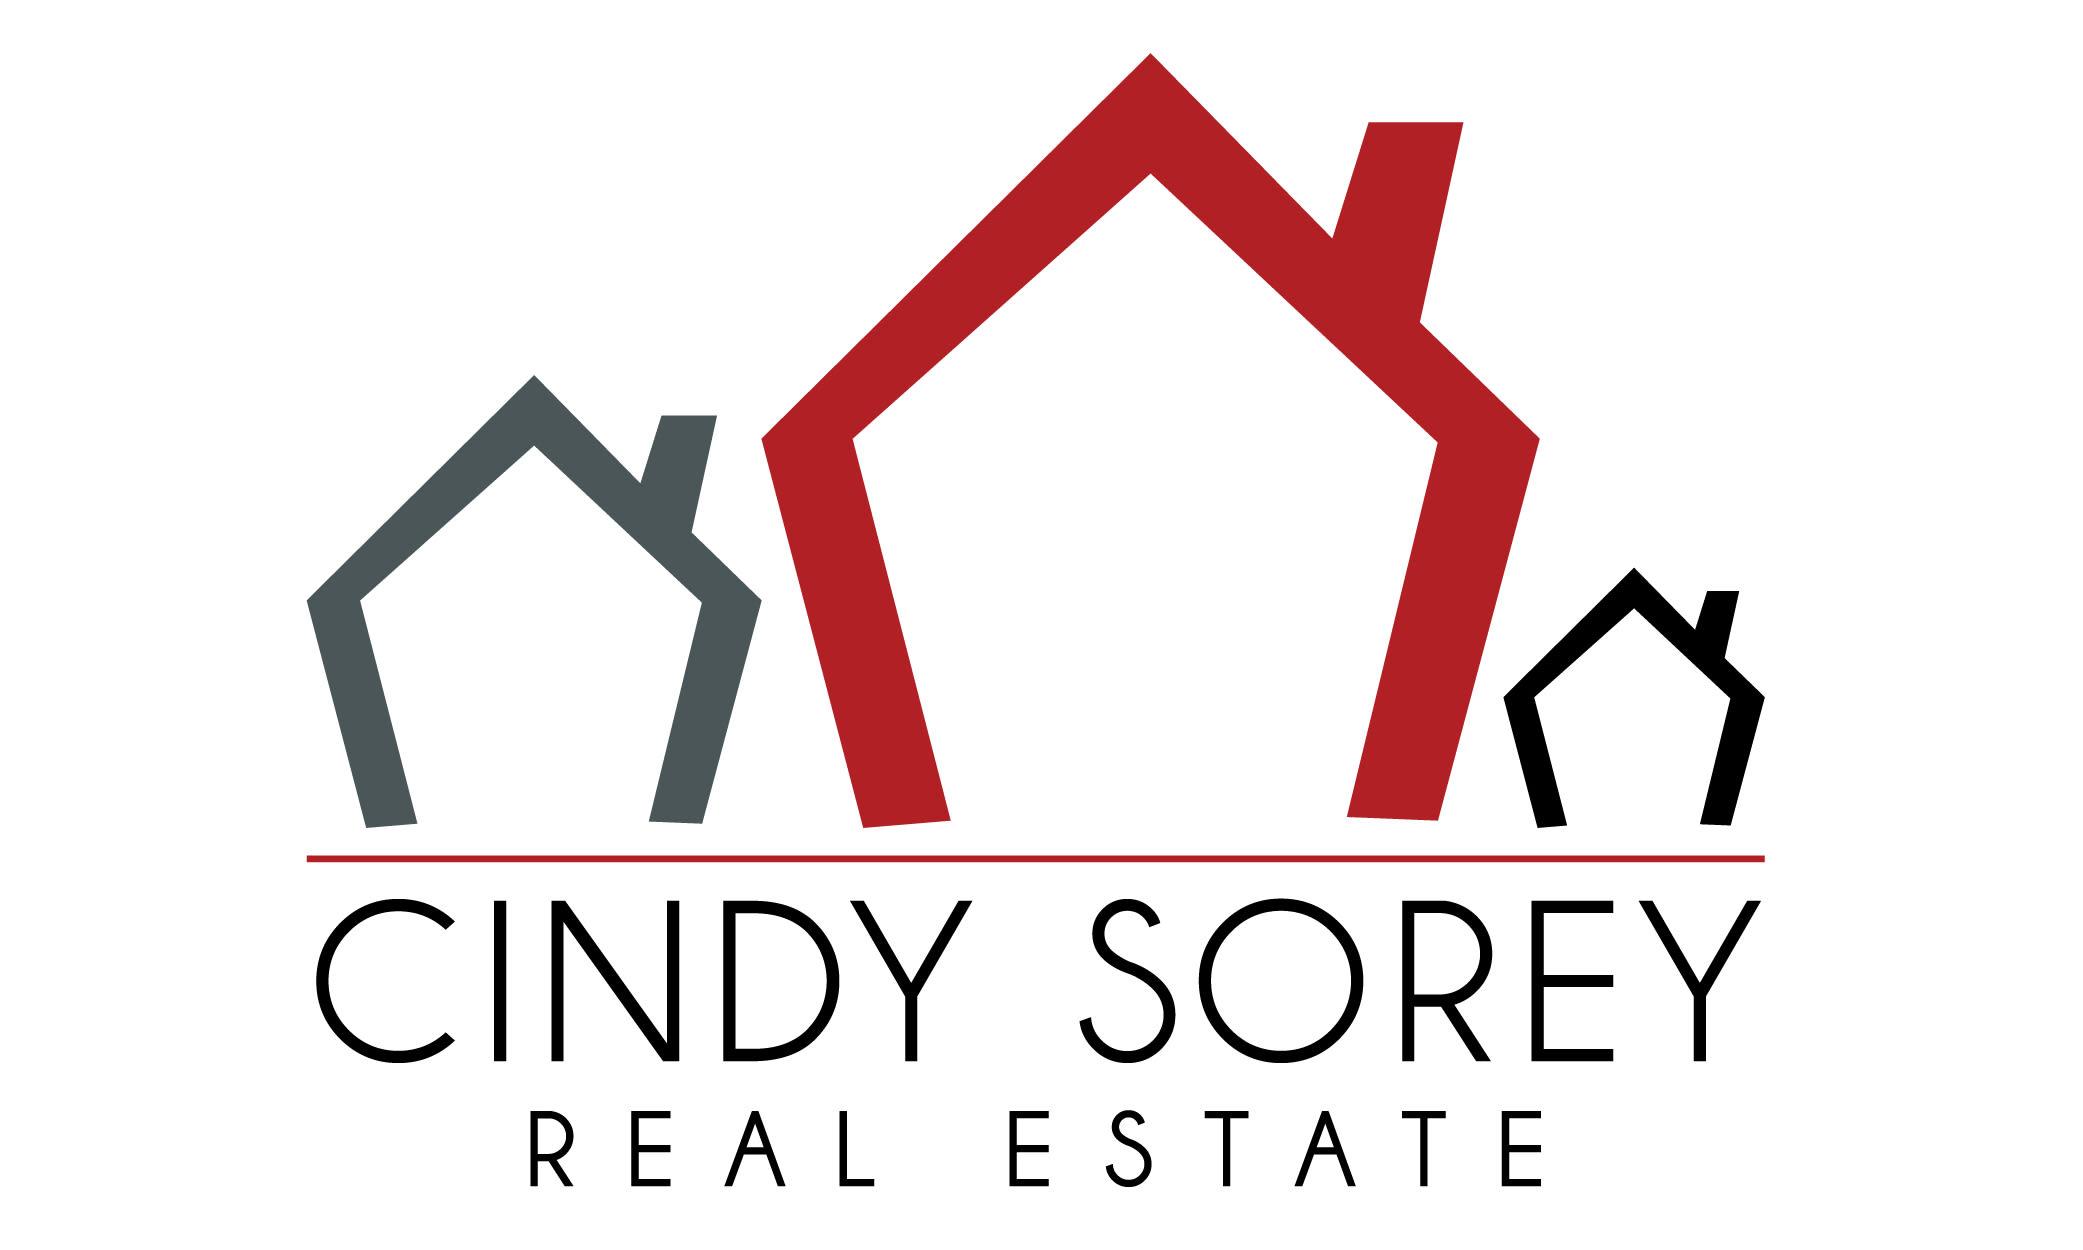 Cindy Sorey MBA, Realtor®, CDPE, SFR, SRES